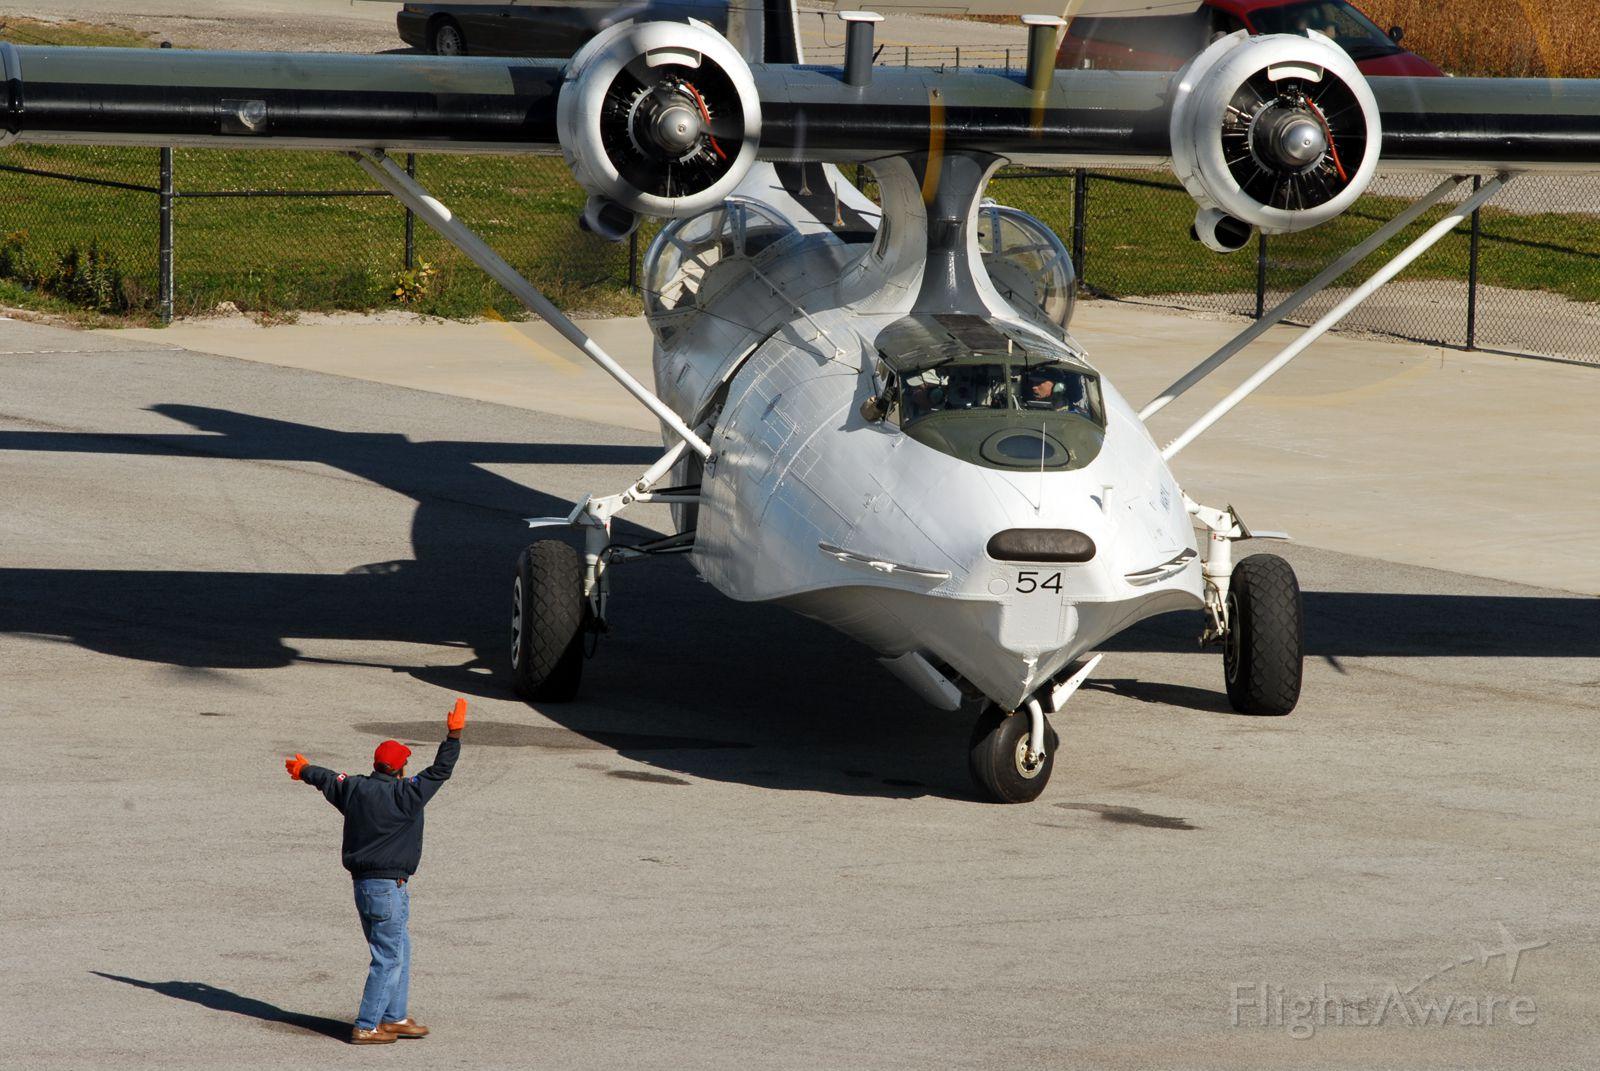 C-FPQL — - 2008, Canadian Warplane Museum, Catalina